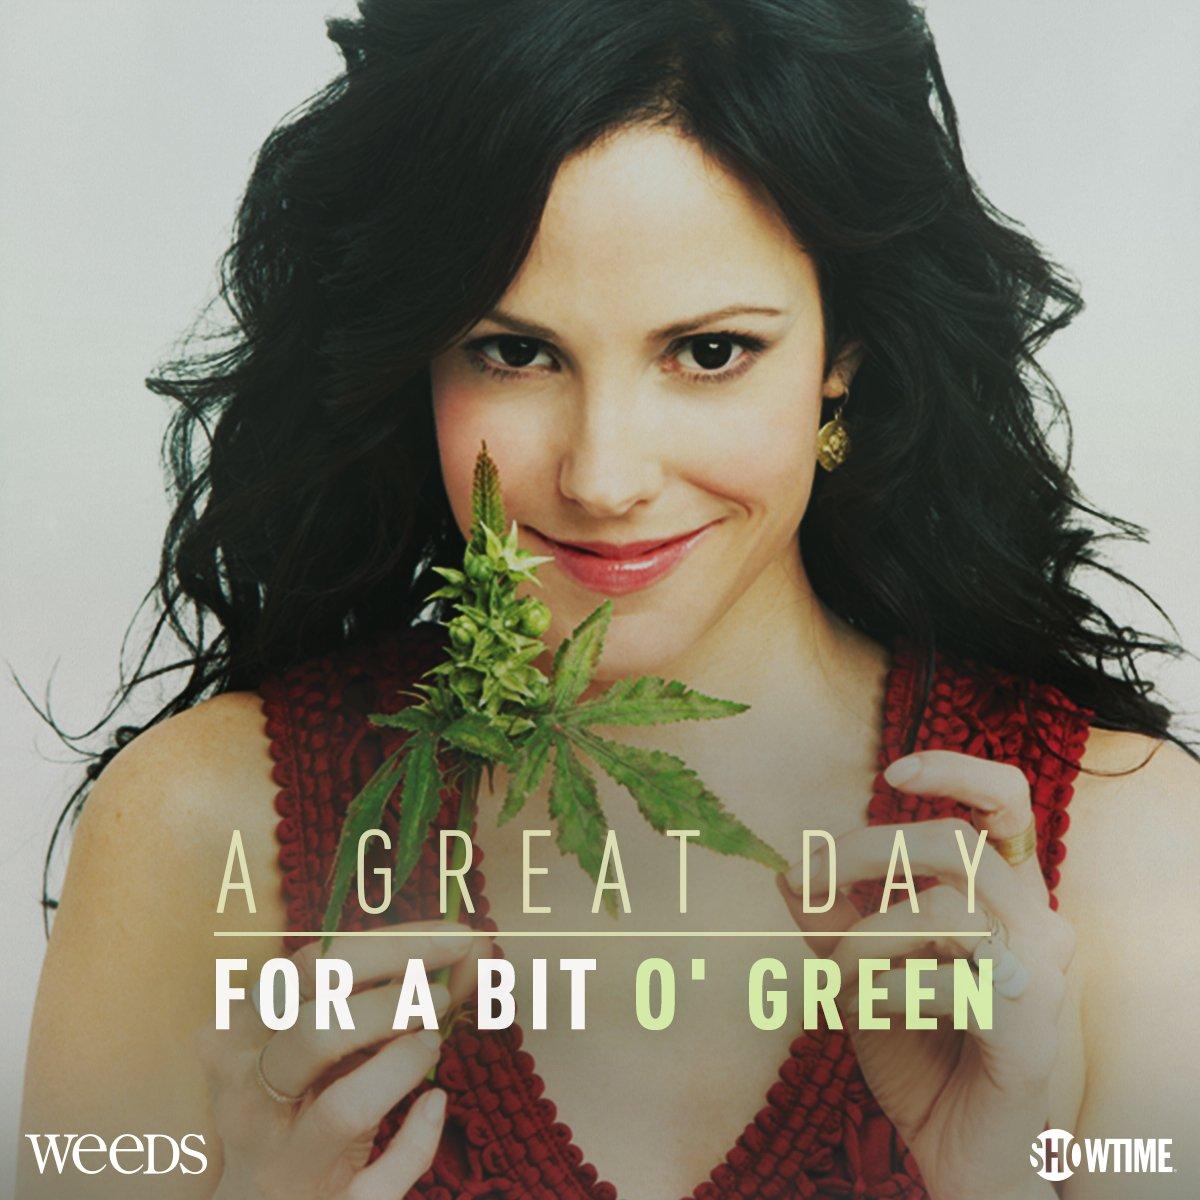 Go green this #StPatricksDay! Stream #Weeds on https://t.co/pvDSrv0YpY. https://t.co/PVztFjfRgP